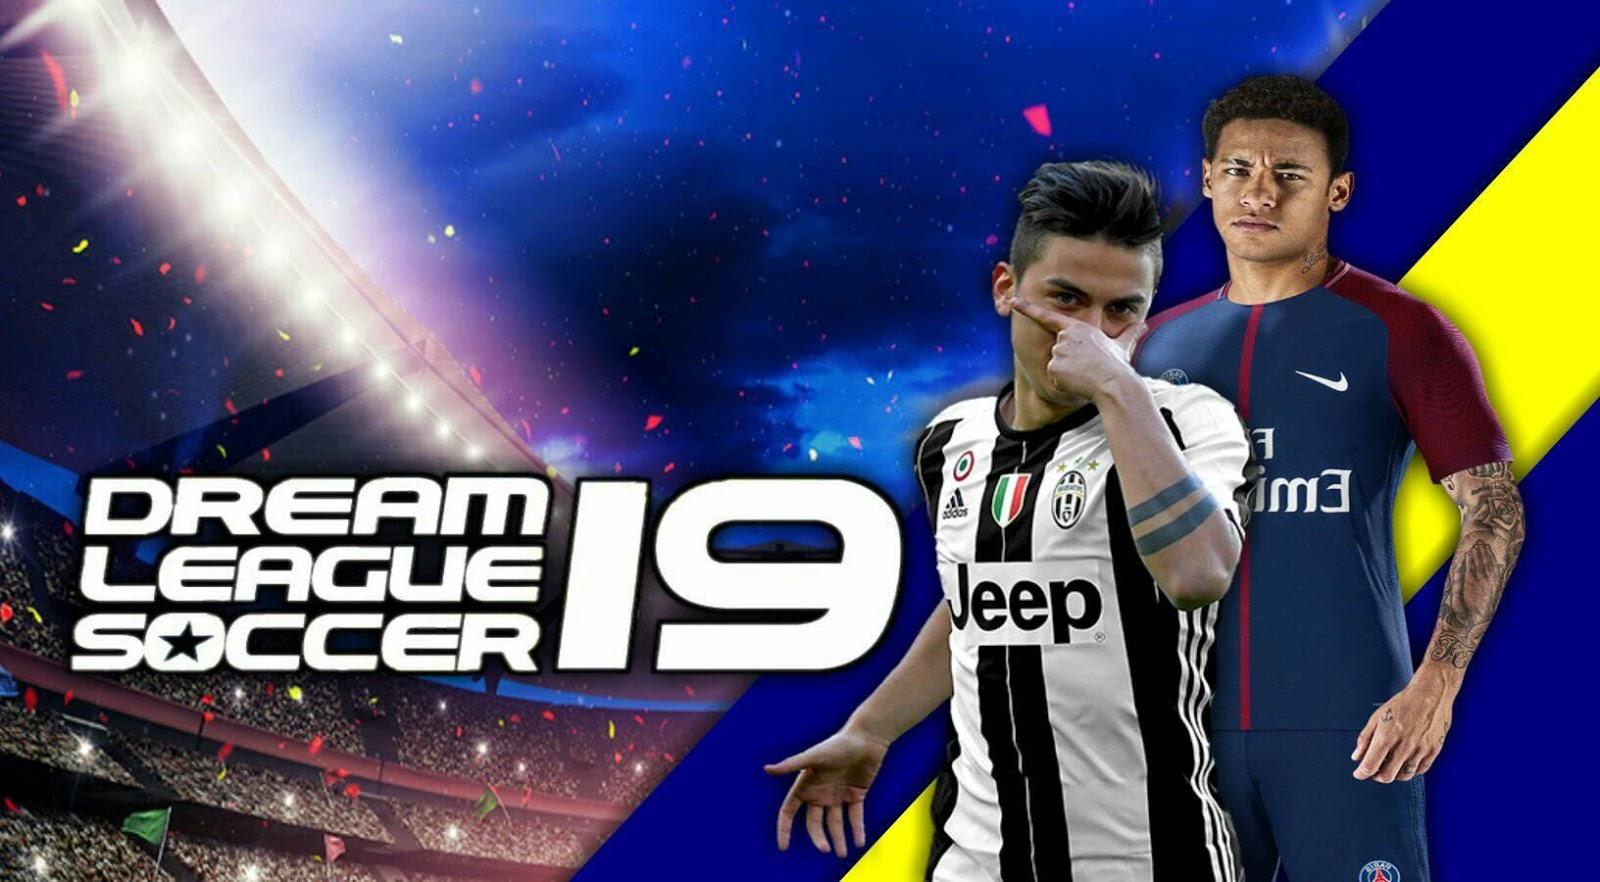 dream league soccer 2019 mod apk for android